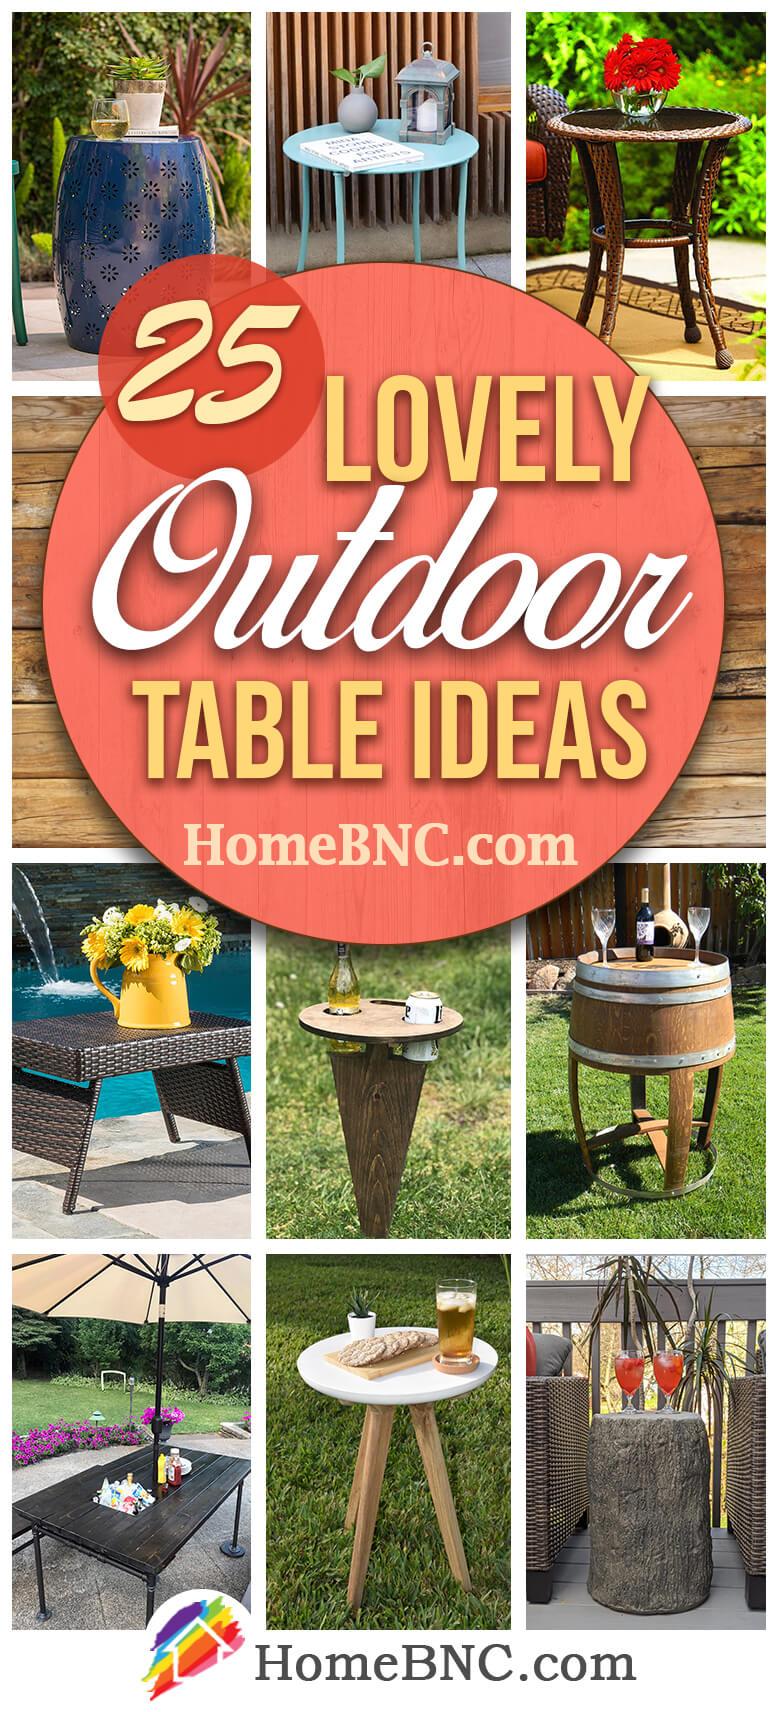 Best Outdoor Table Ideas